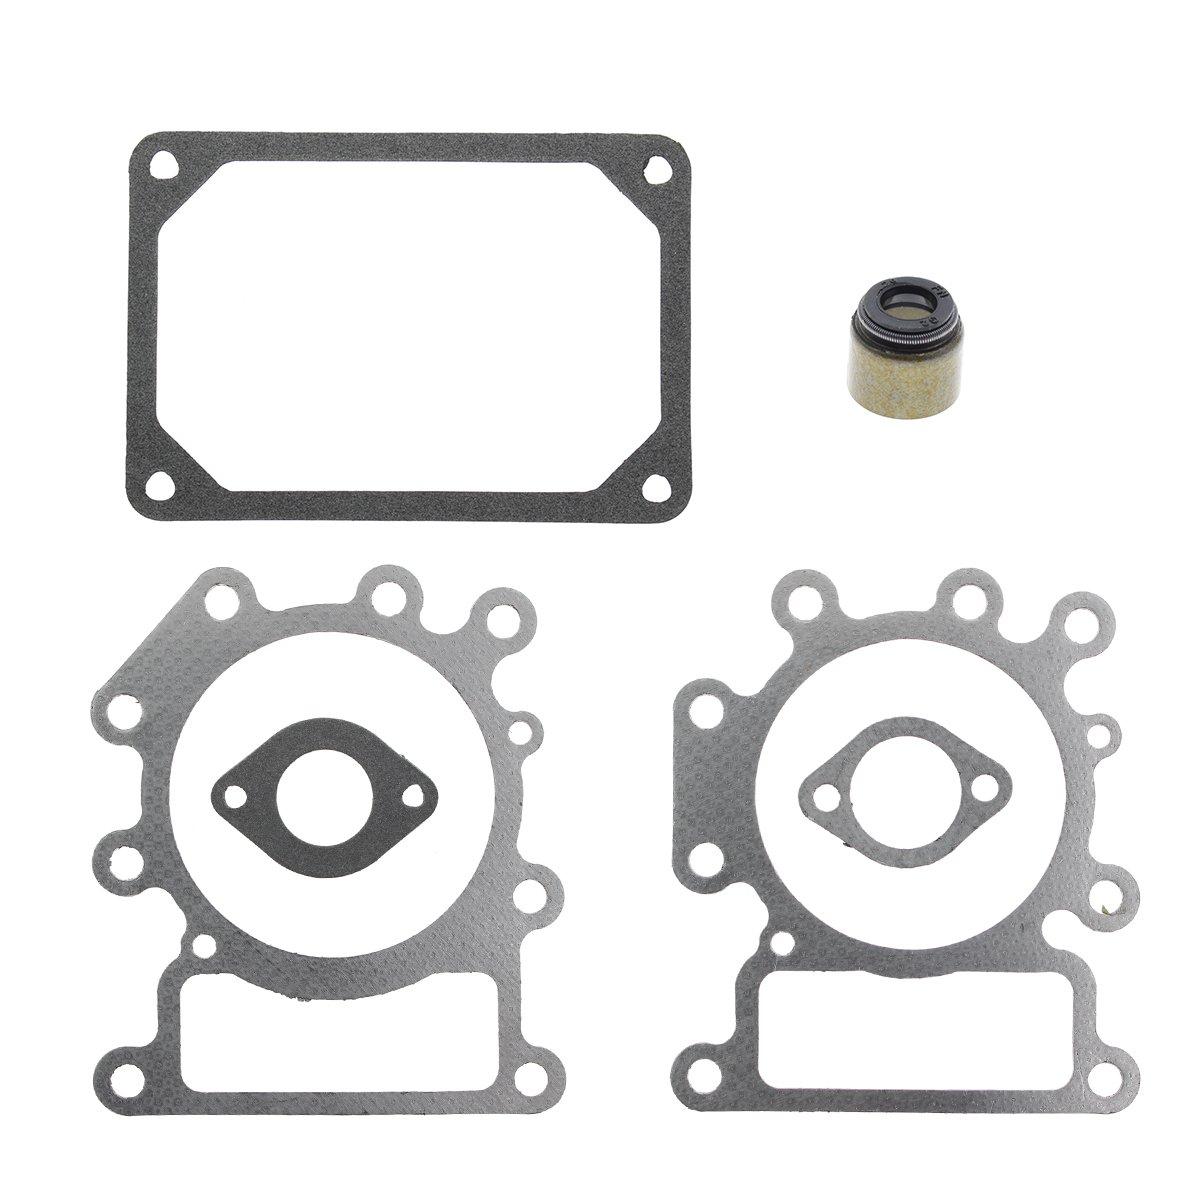 Goodeal Valve Gasket Kit for Briggs & Stratton 794152 690190 Engine 310707 310777 311707